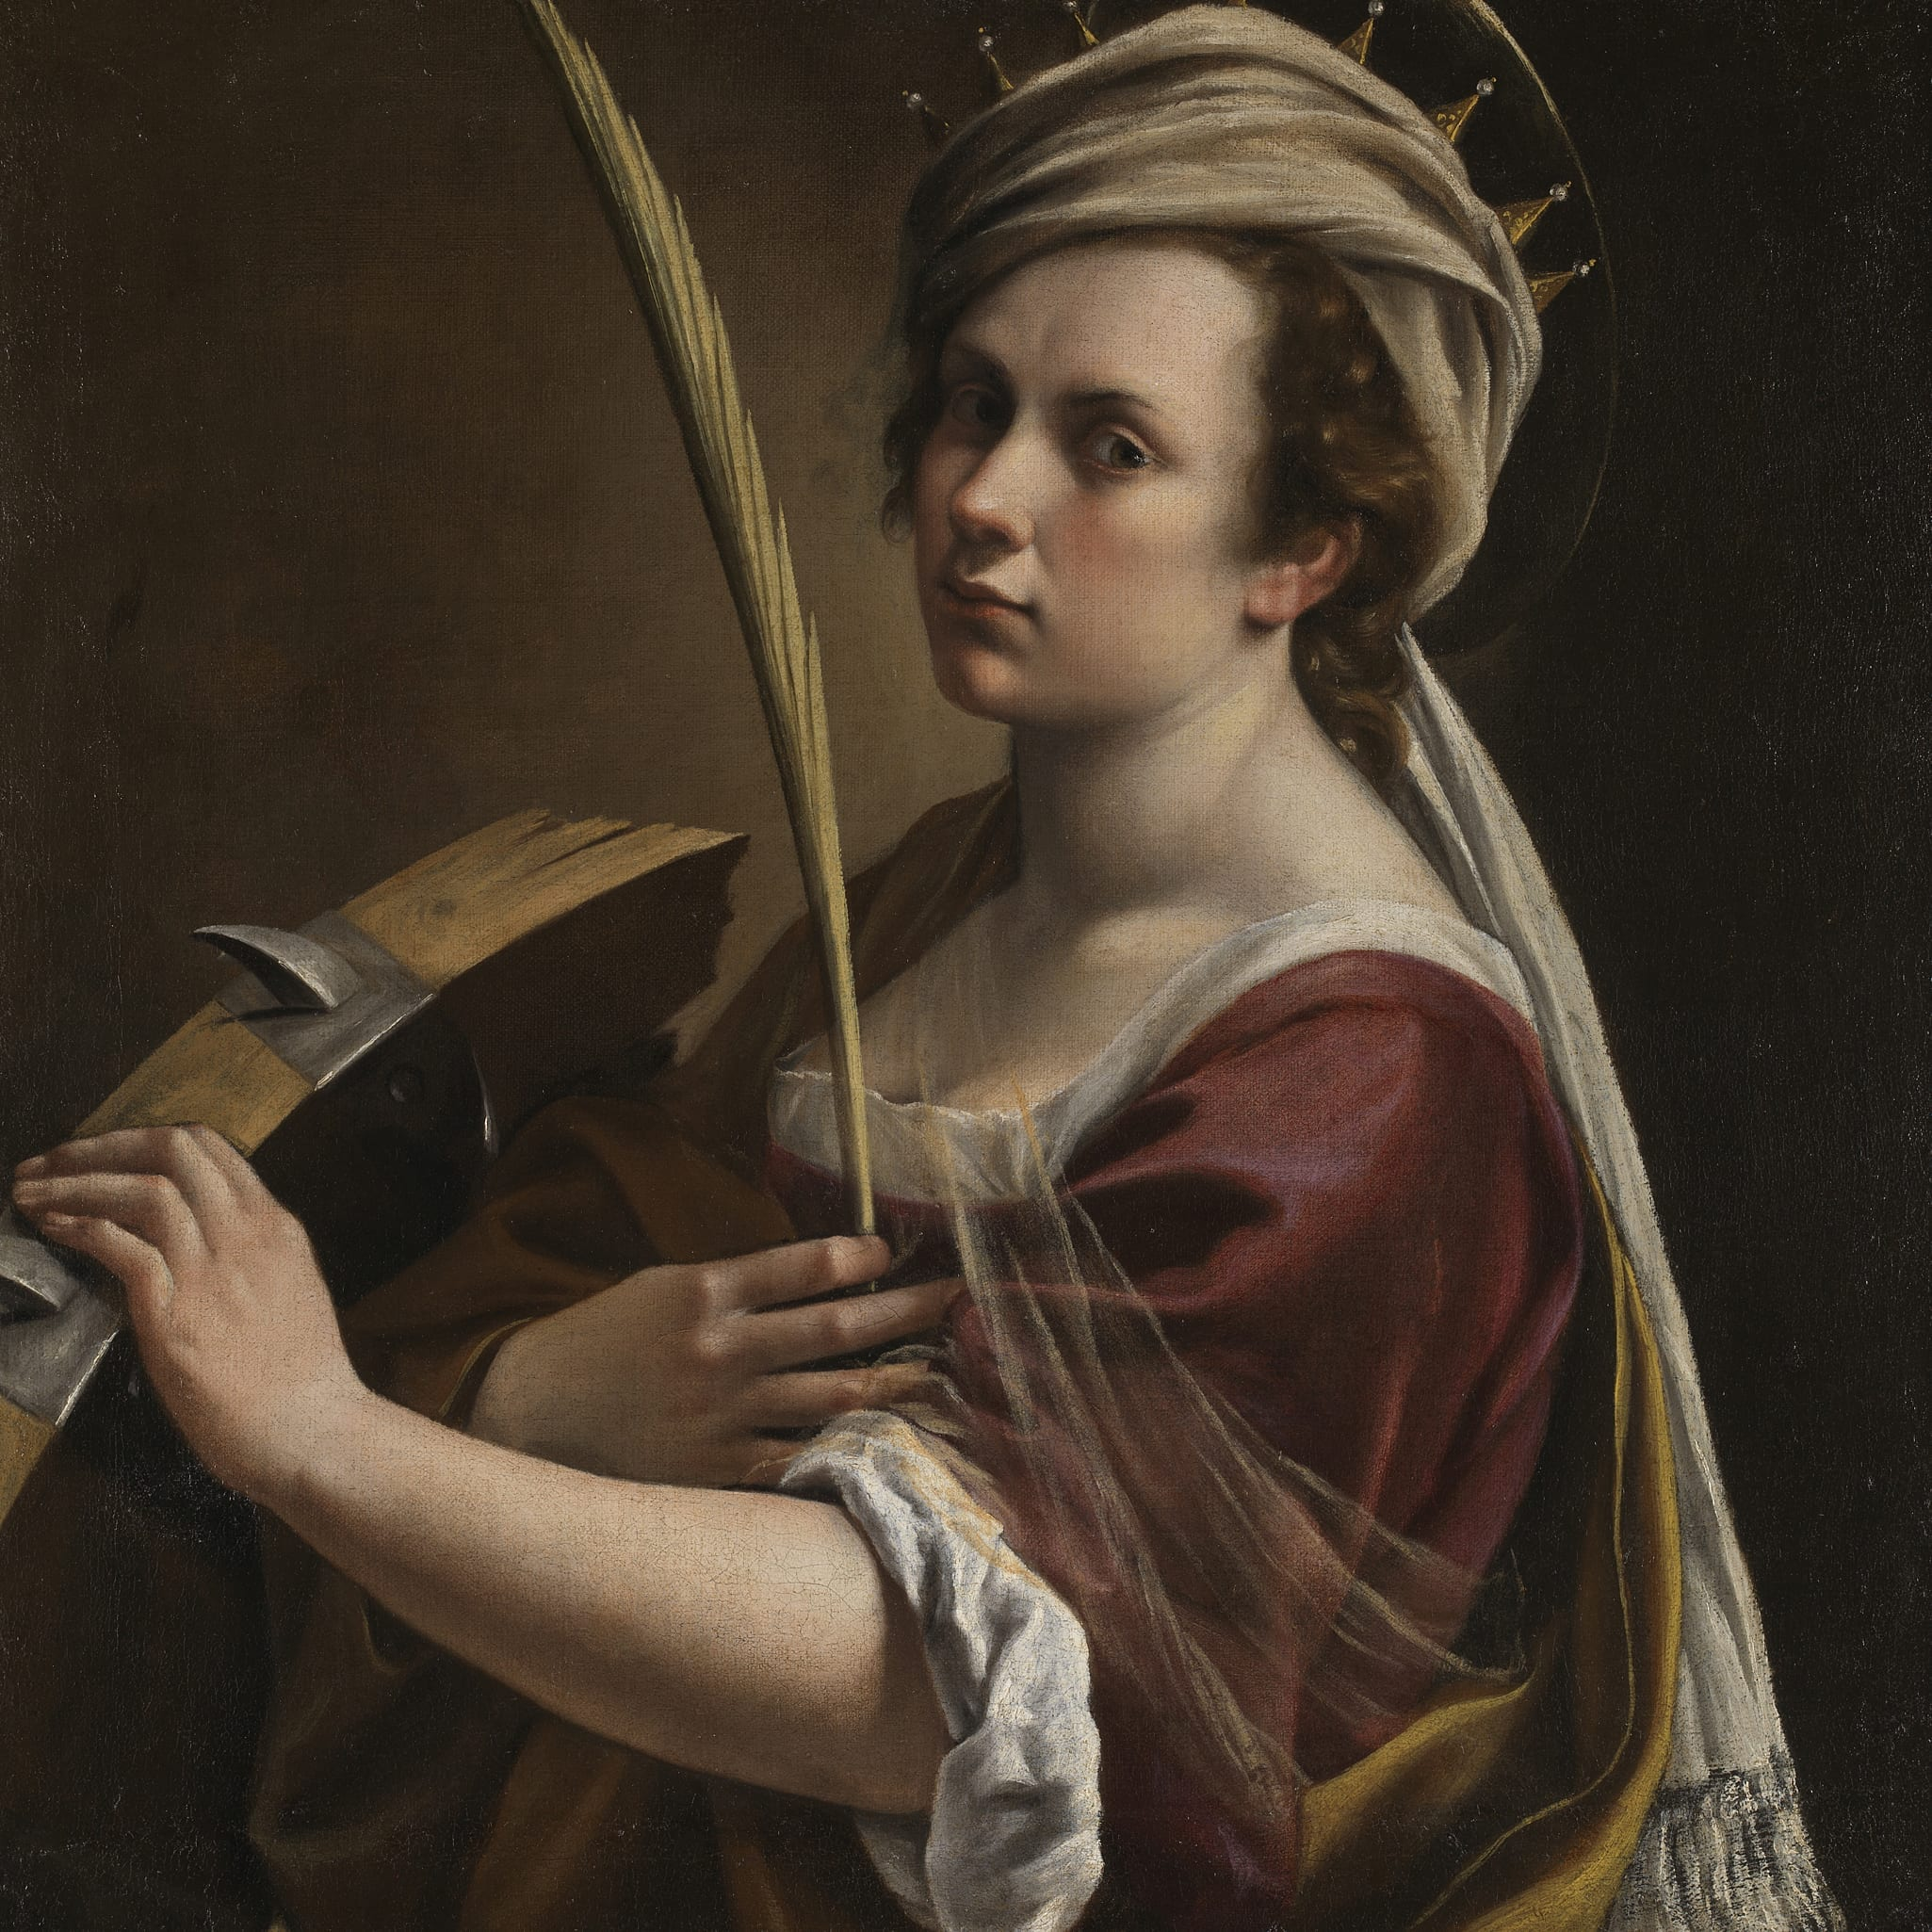 Artemisia. Выставка работ Артемизии Джентилески